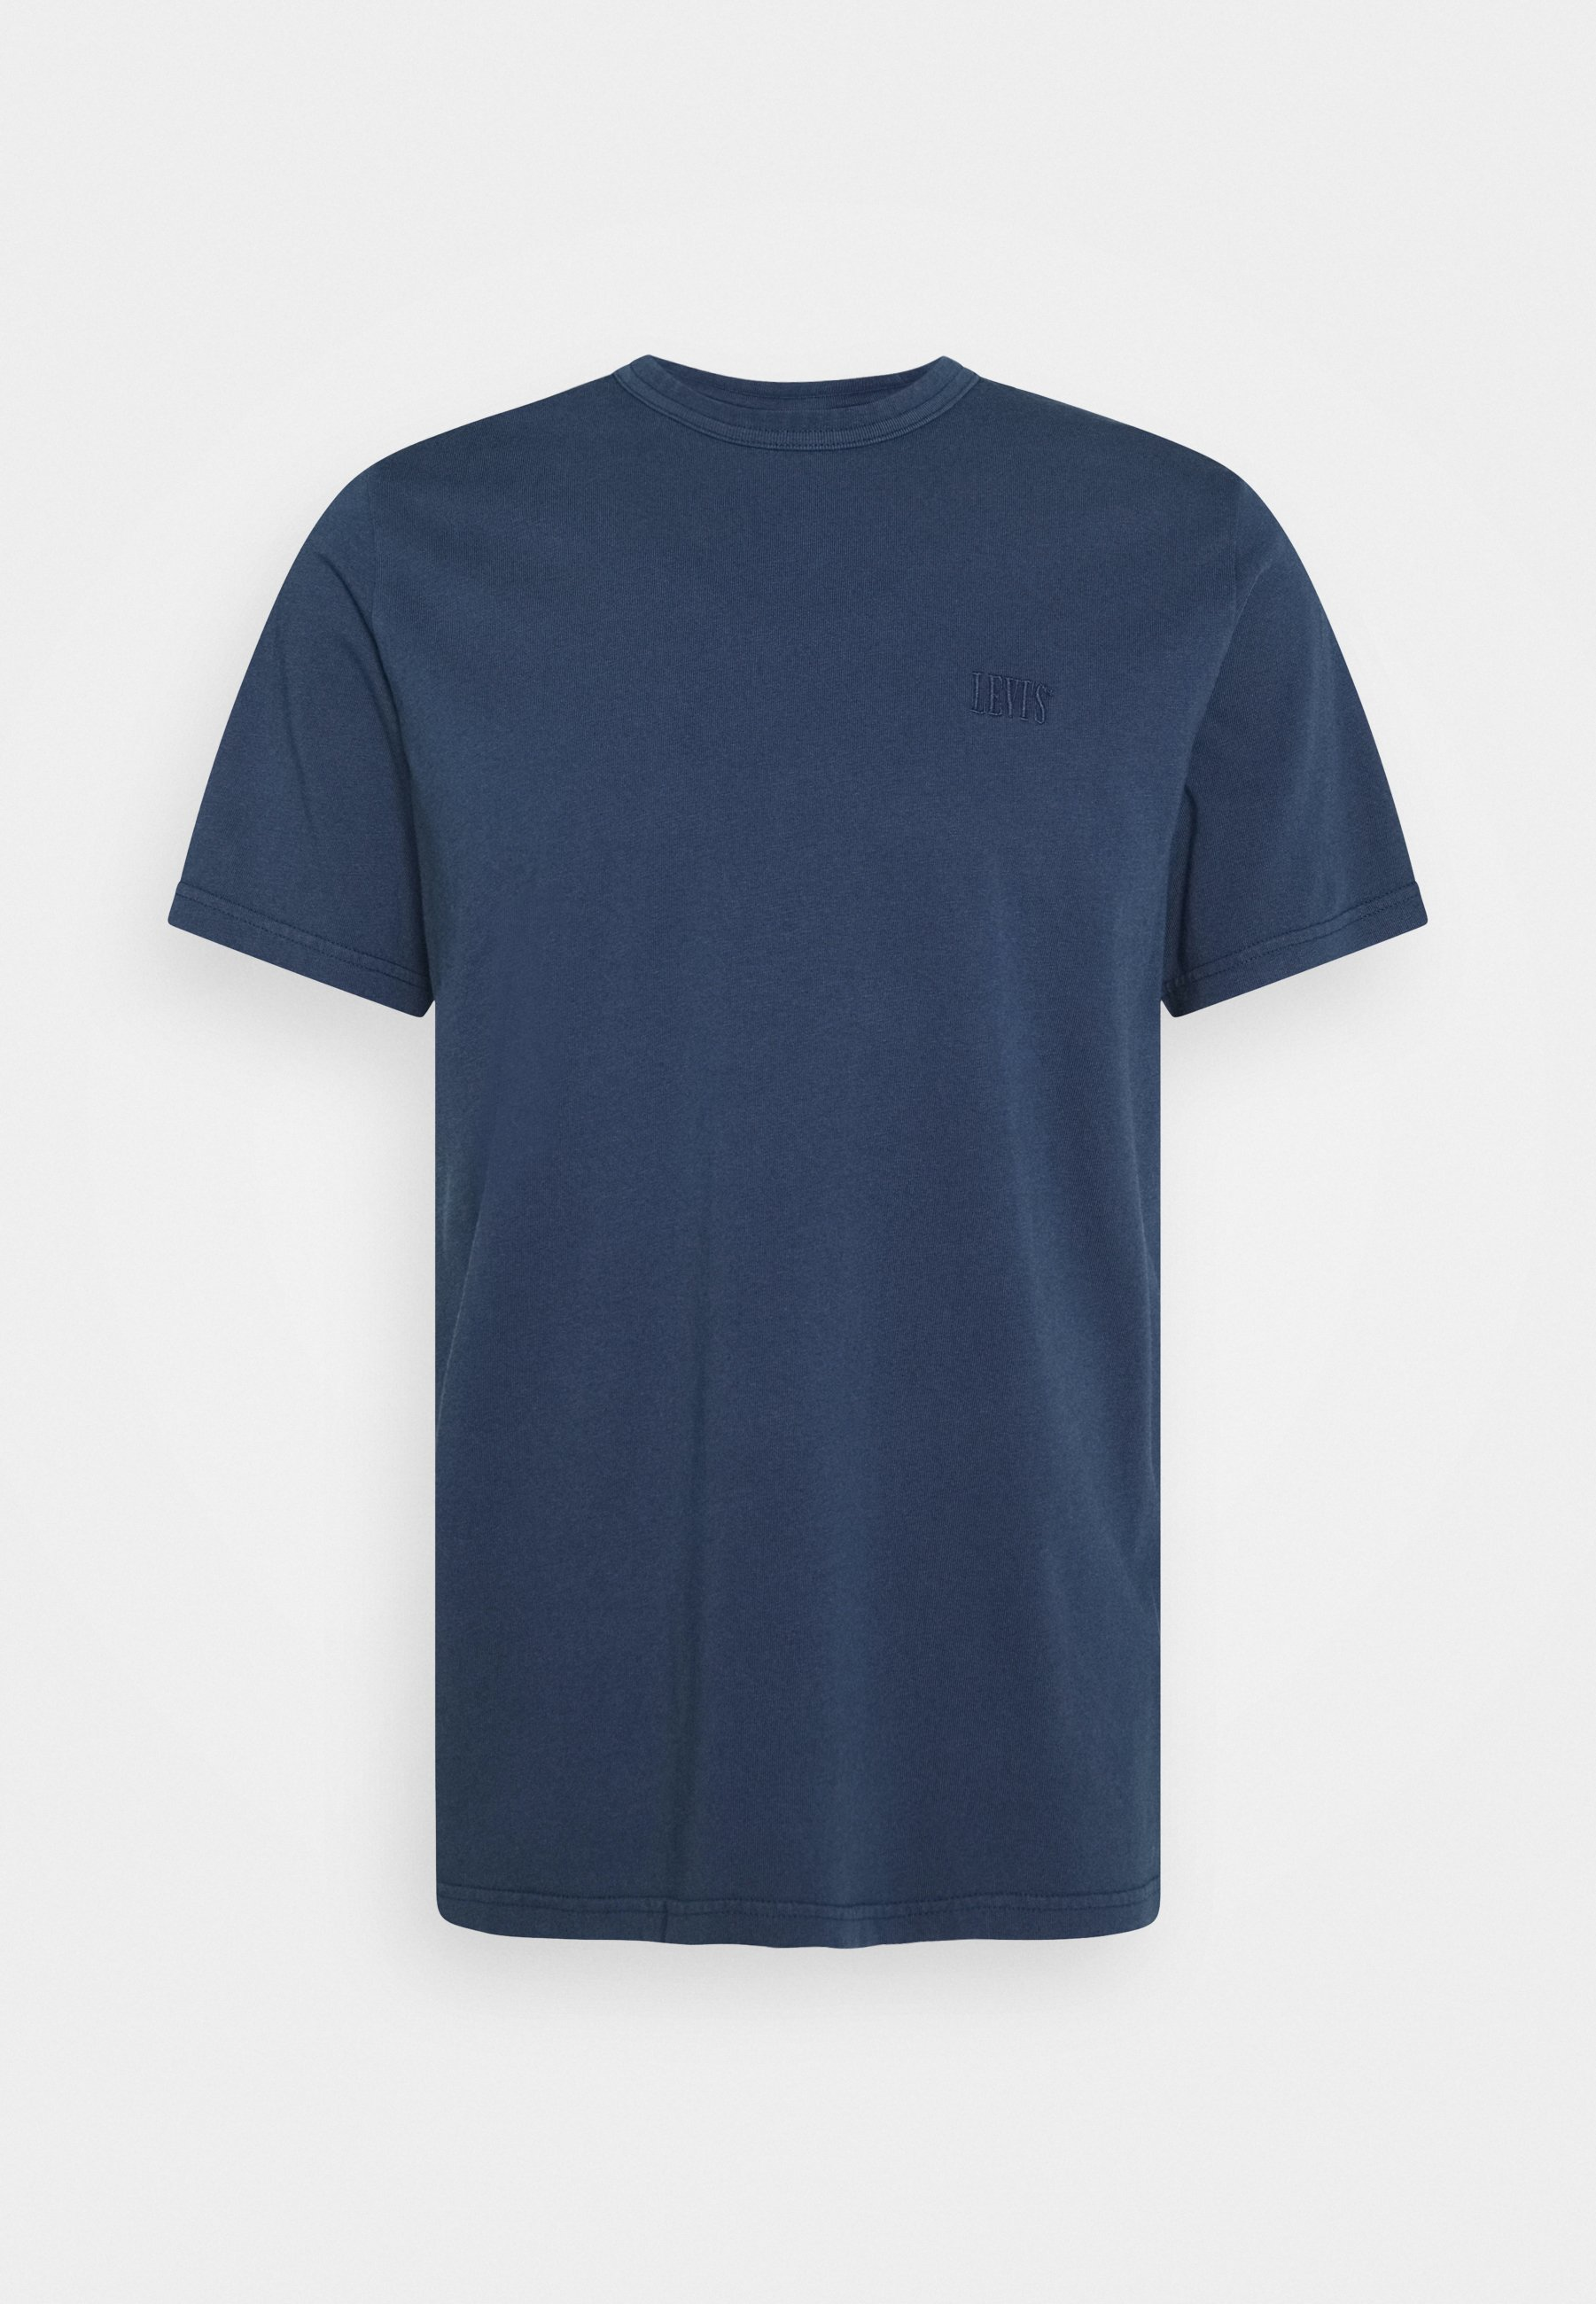 Levi's® Authentic Crewneck Tee - T-shirts Dark Blue/mørkeblå